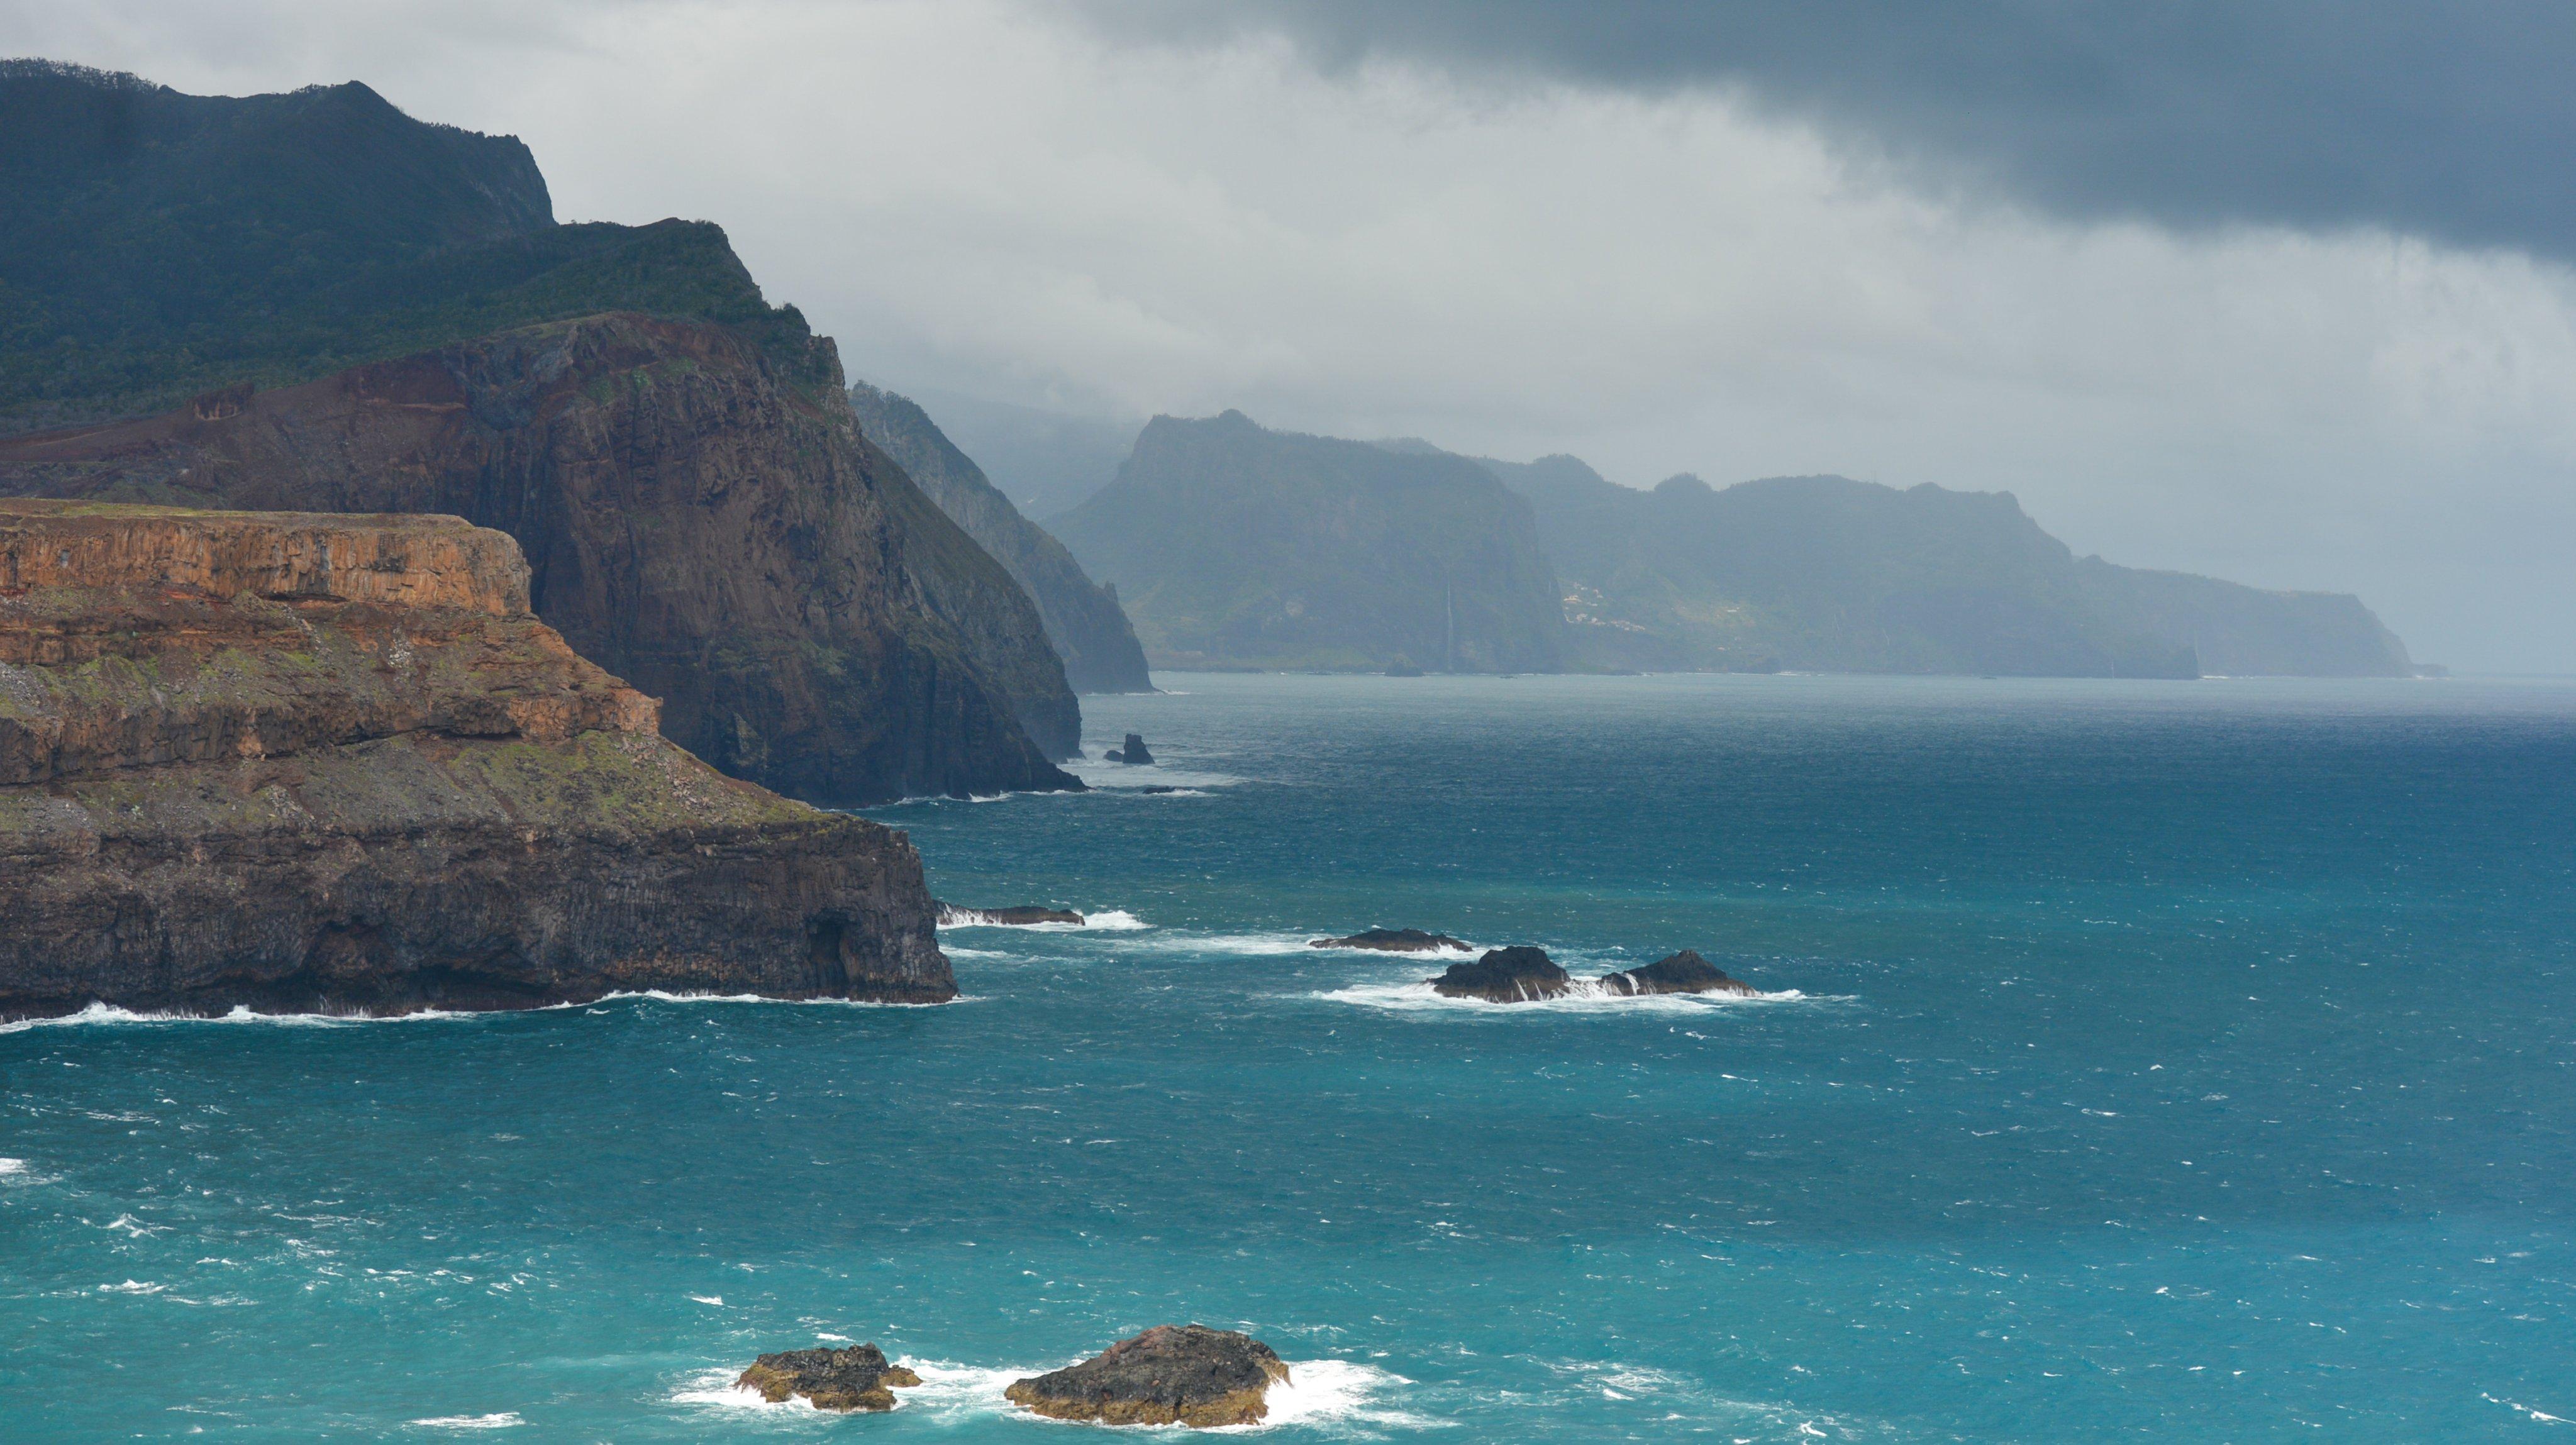 Touring the island of Madeira